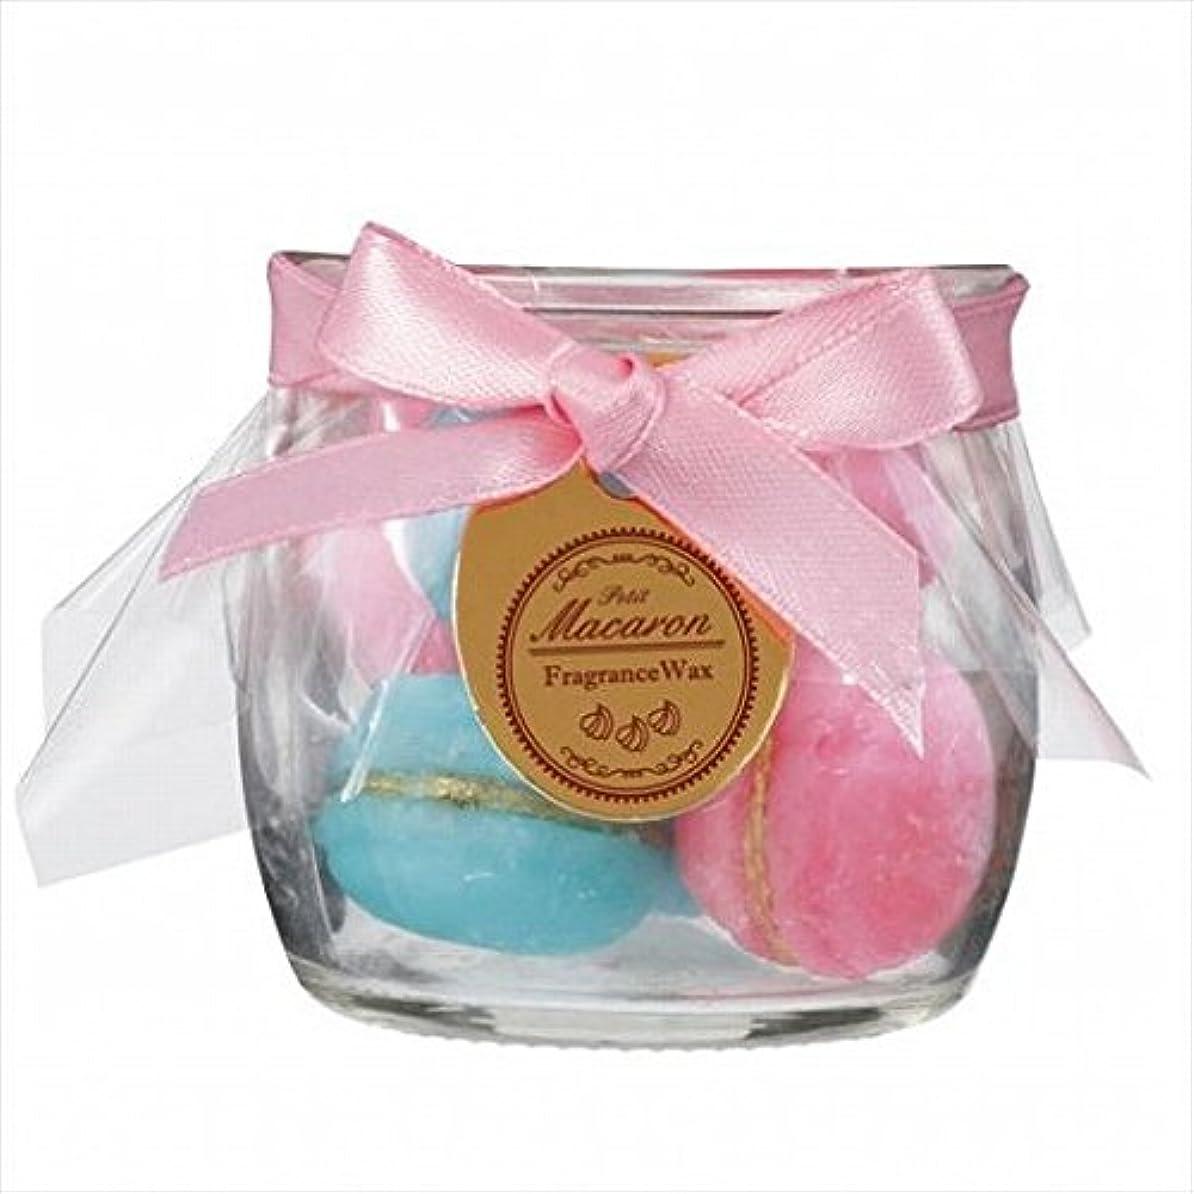 sweets candle(スイーツキャンドル) プチマカロンフレグランス 「 ピーチ 」 キャンドル 60x60x56mm (A3160540)